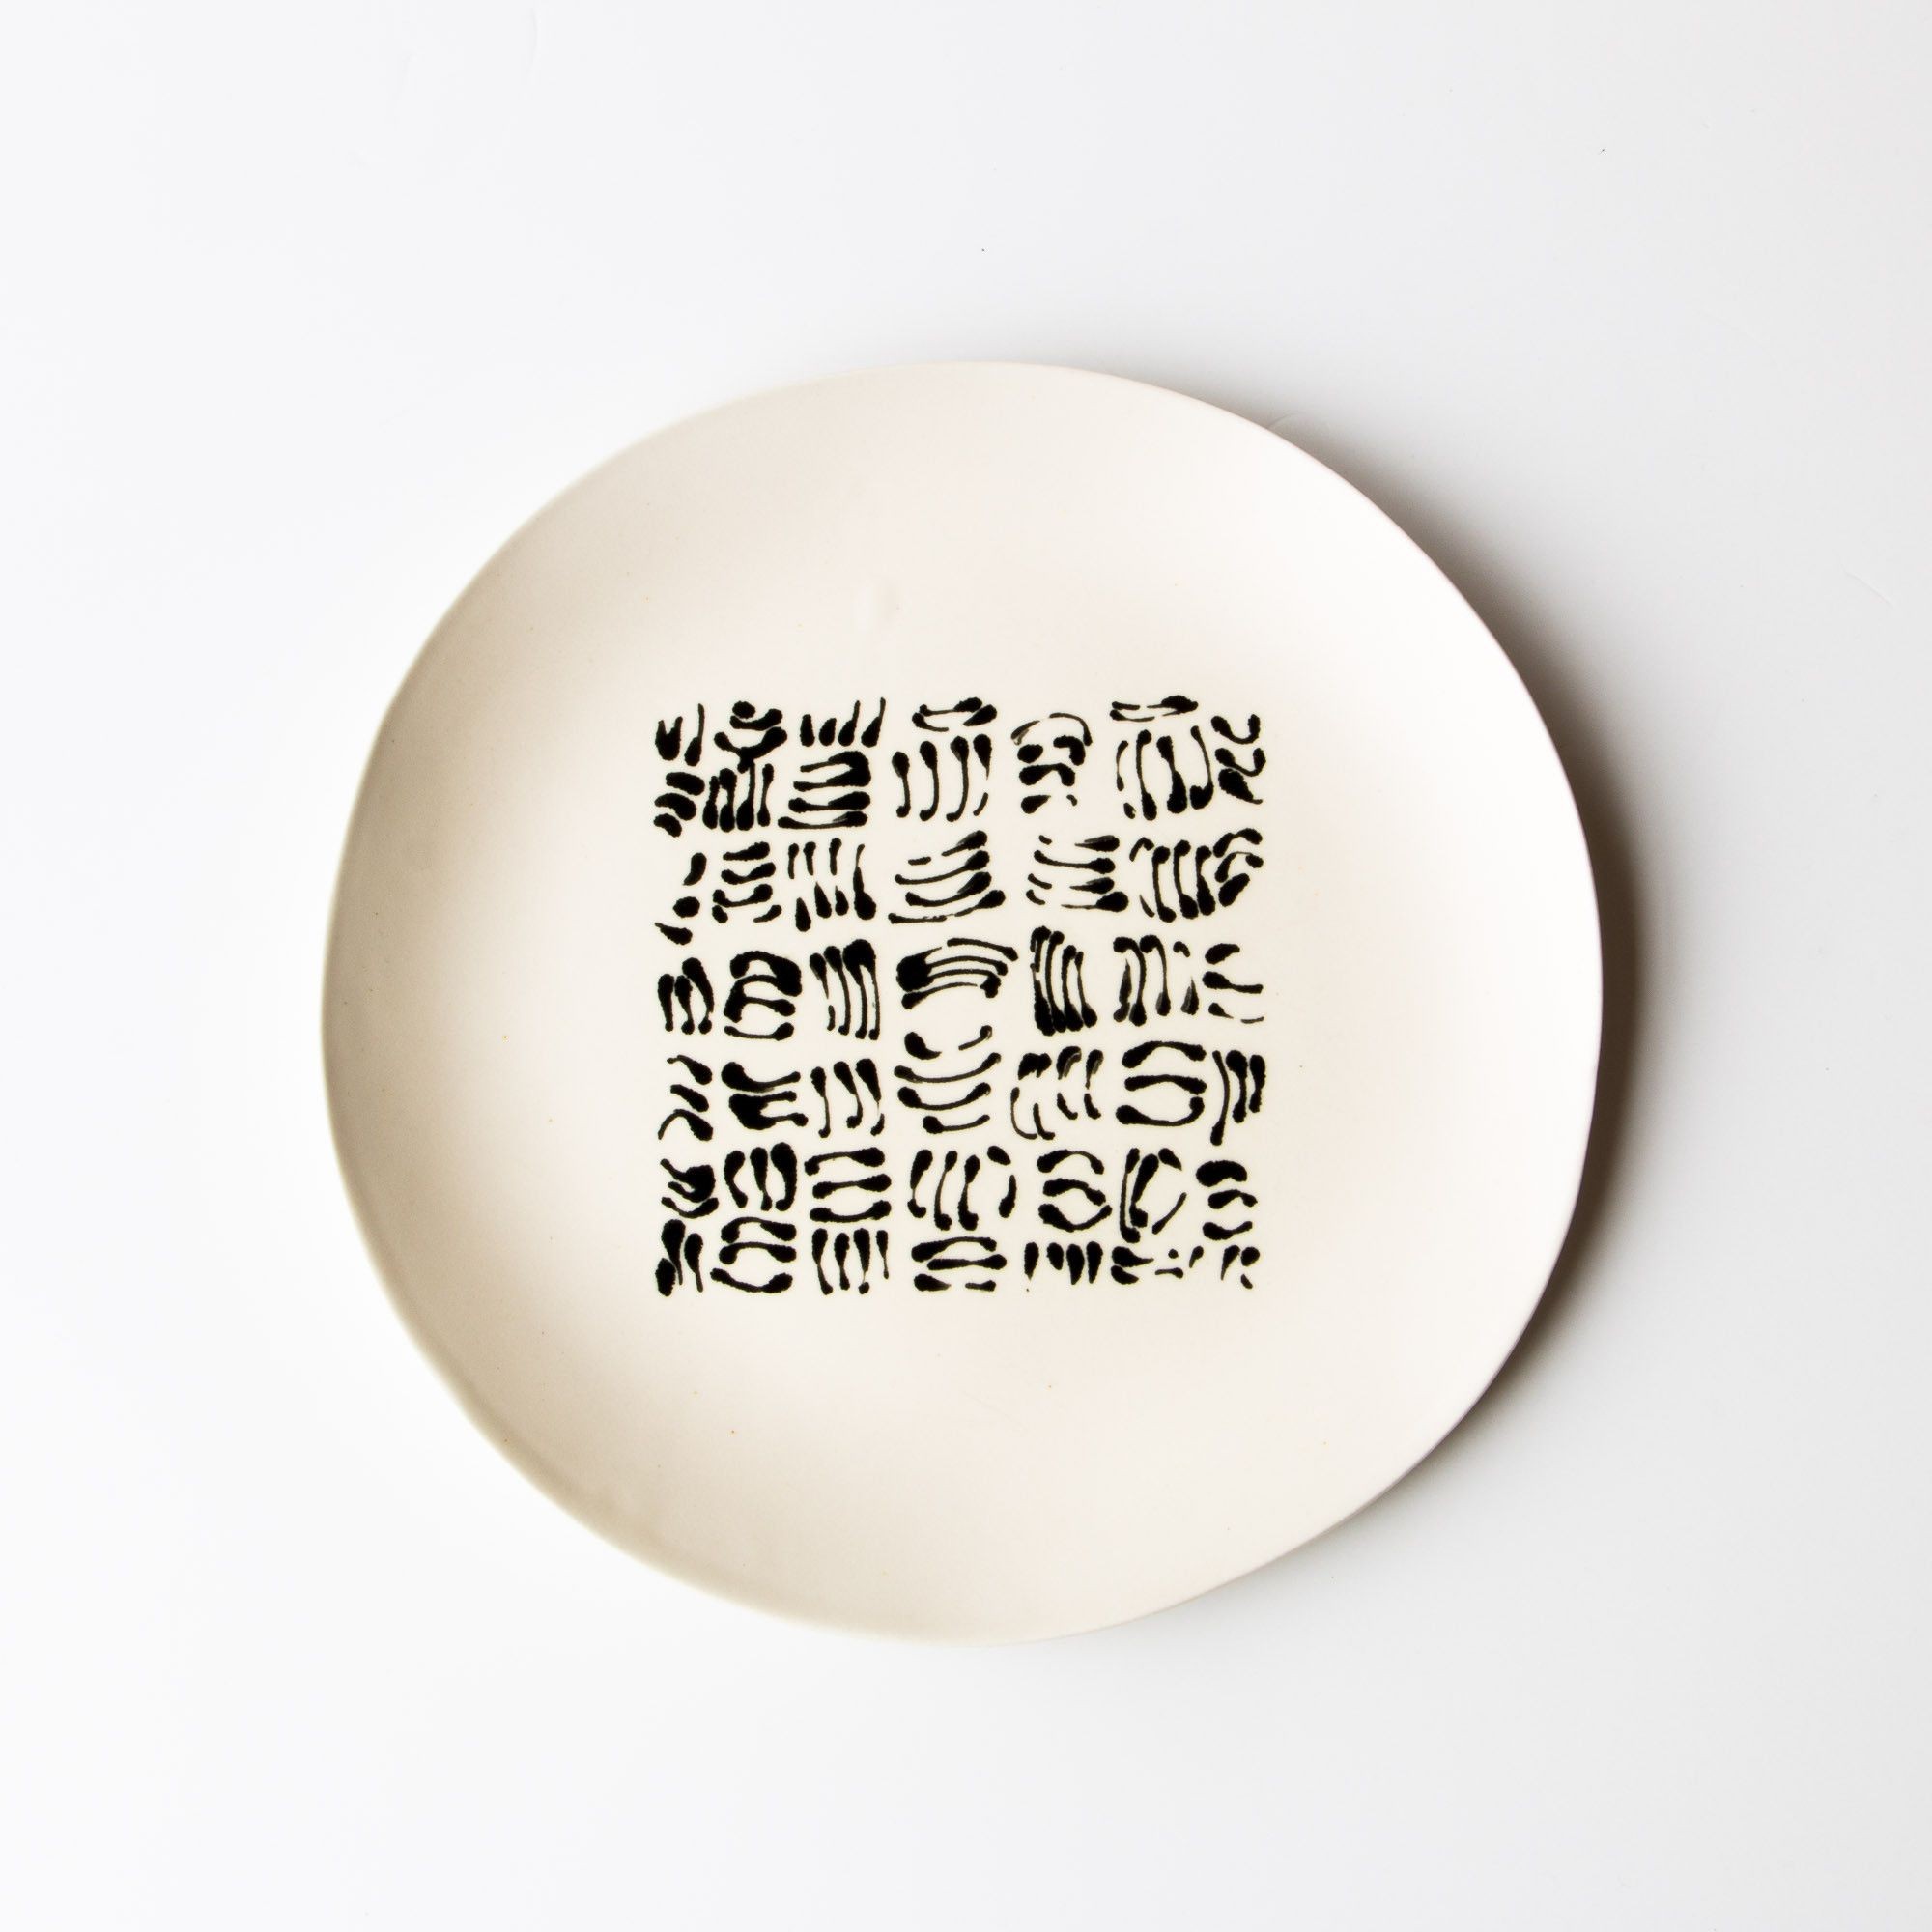 Um? - Large Hand Painted Black u0026 White Ceramic Plates - Rachel Grenon  sc 1 st  Pinterest & Um? - Large Hand Painted Black u0026 White Ceramic Plates - Rachel ...